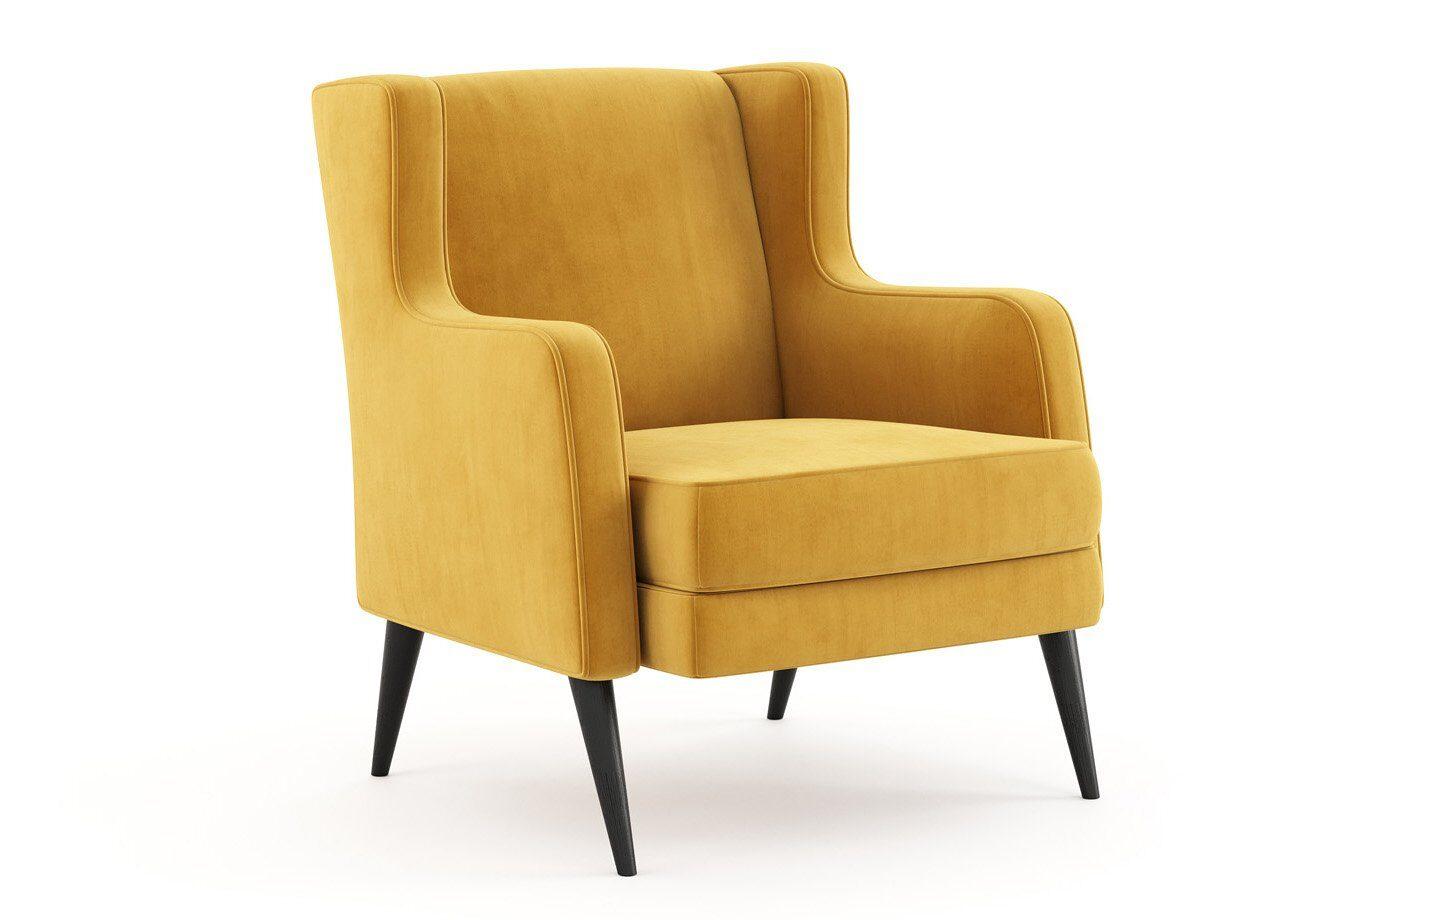 Mariposa-Lounge-Chair-by-fabiia-furniture-signature-1